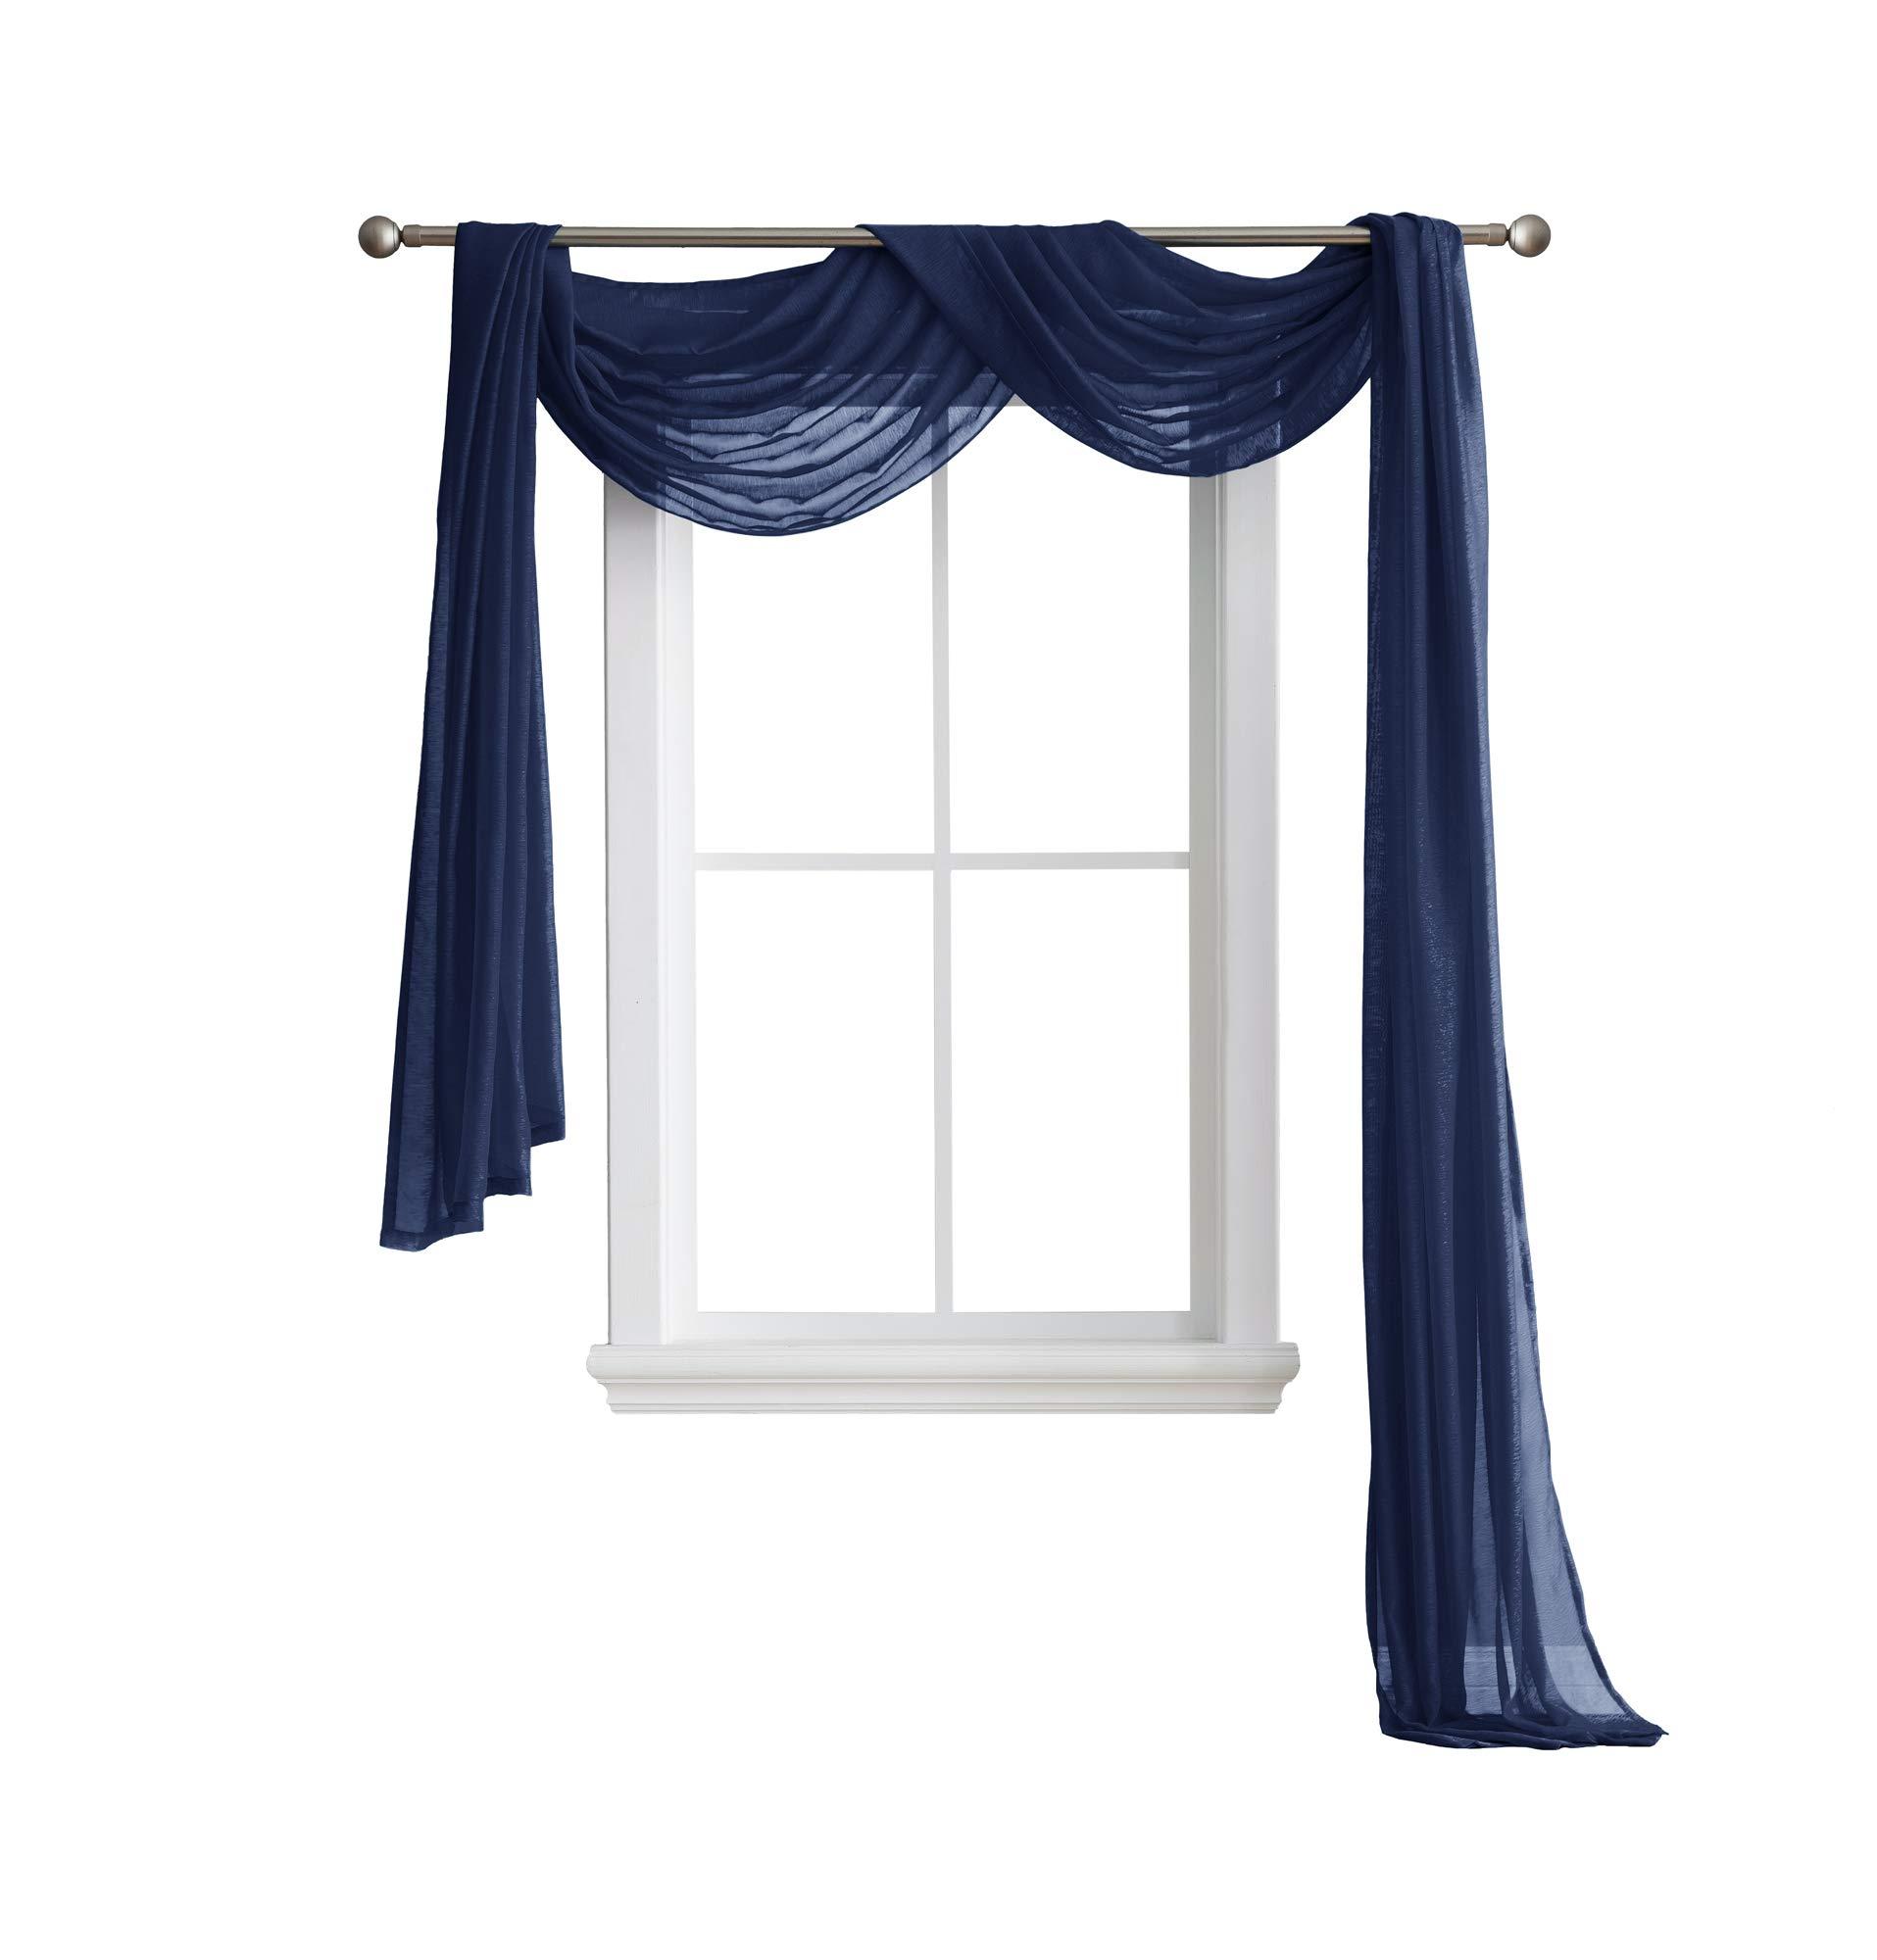 LinenZone Karina - Semi-Sheer Window Scarf (54 x 216) - Elegant Home Decor Window Treatments - Add to Window Curtains for Enhanced Effect (1 Scarf 54'' x 216'', Navy)